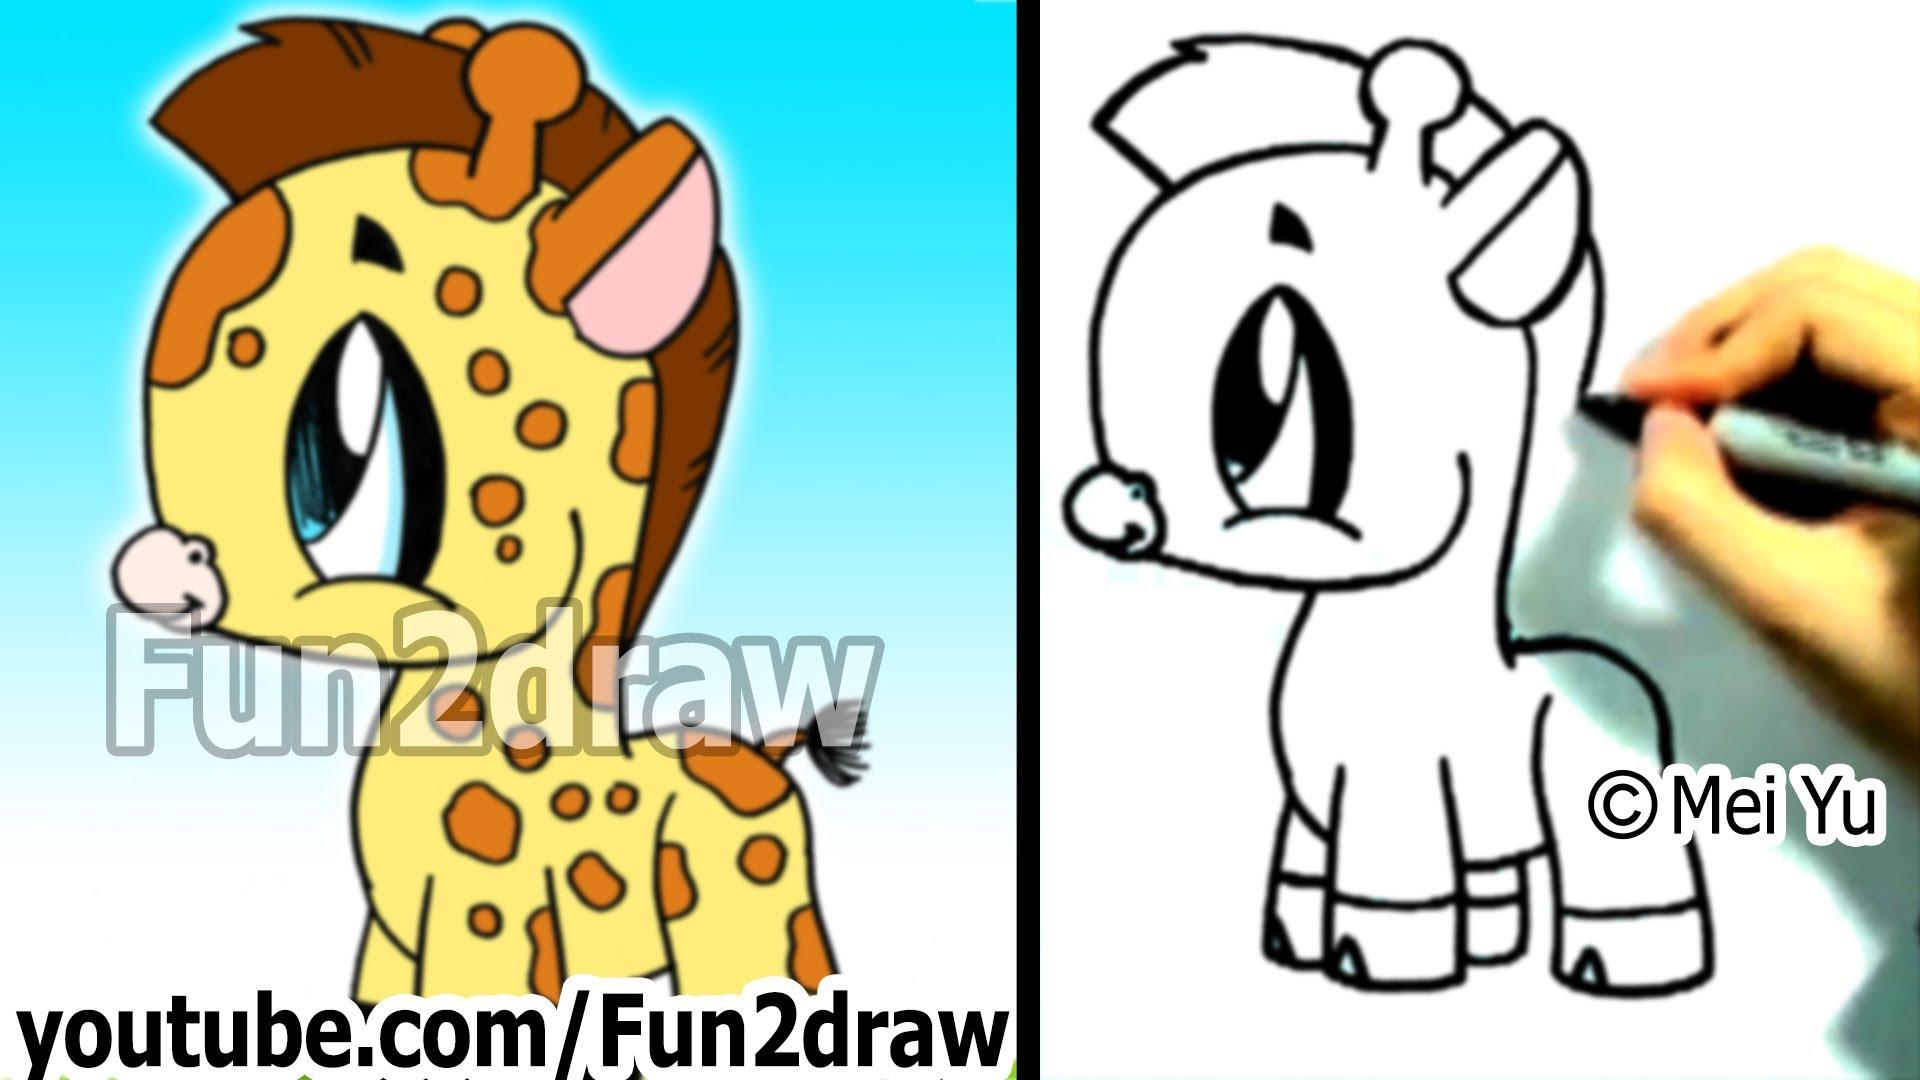 1920x1080 Sweet Looking How To Draw Cute Zoo Animals A Cartoon Giraffe